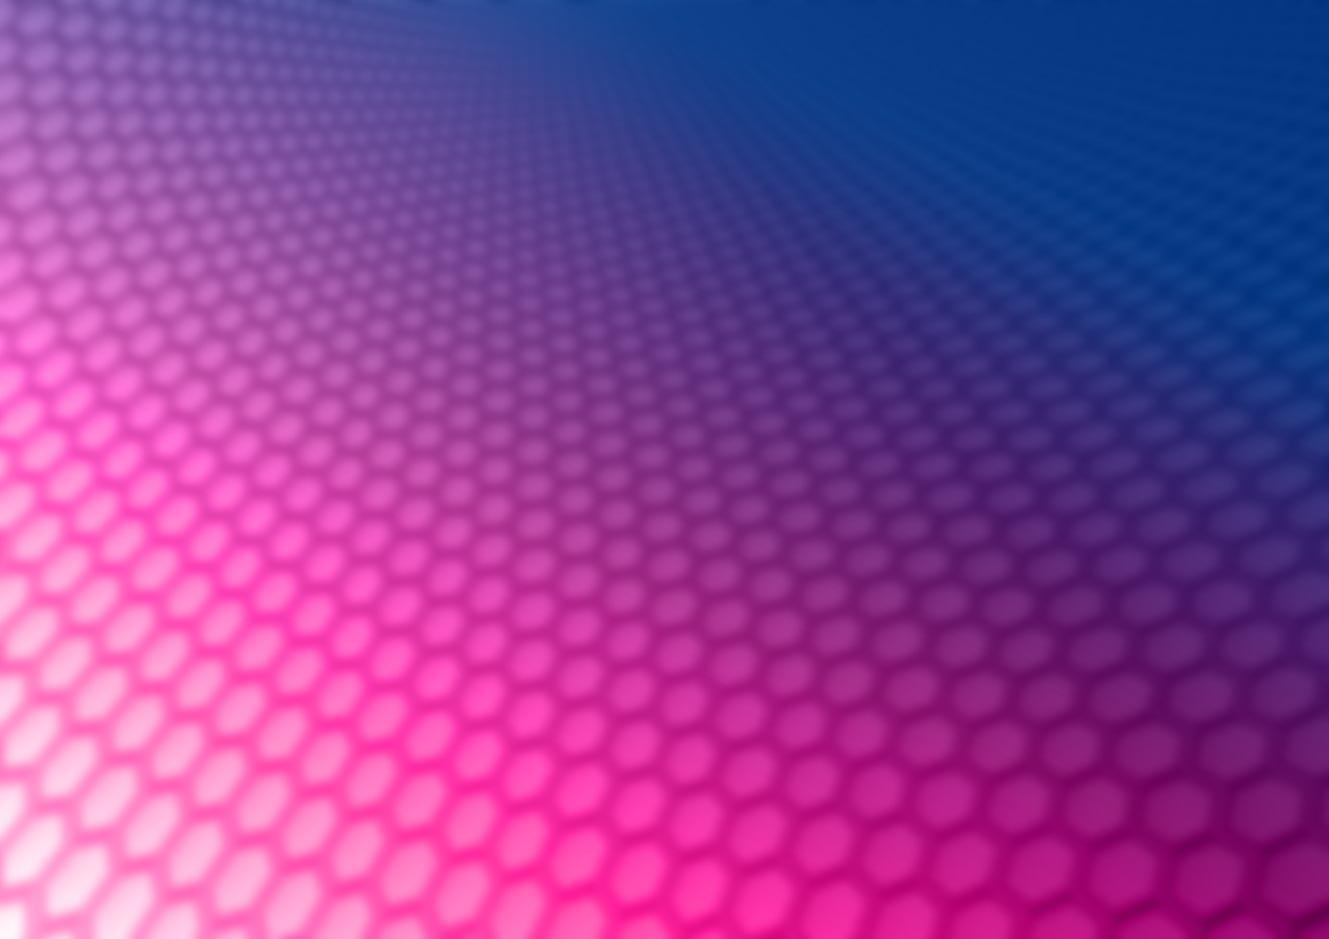 pink fox racing logo wallpaper